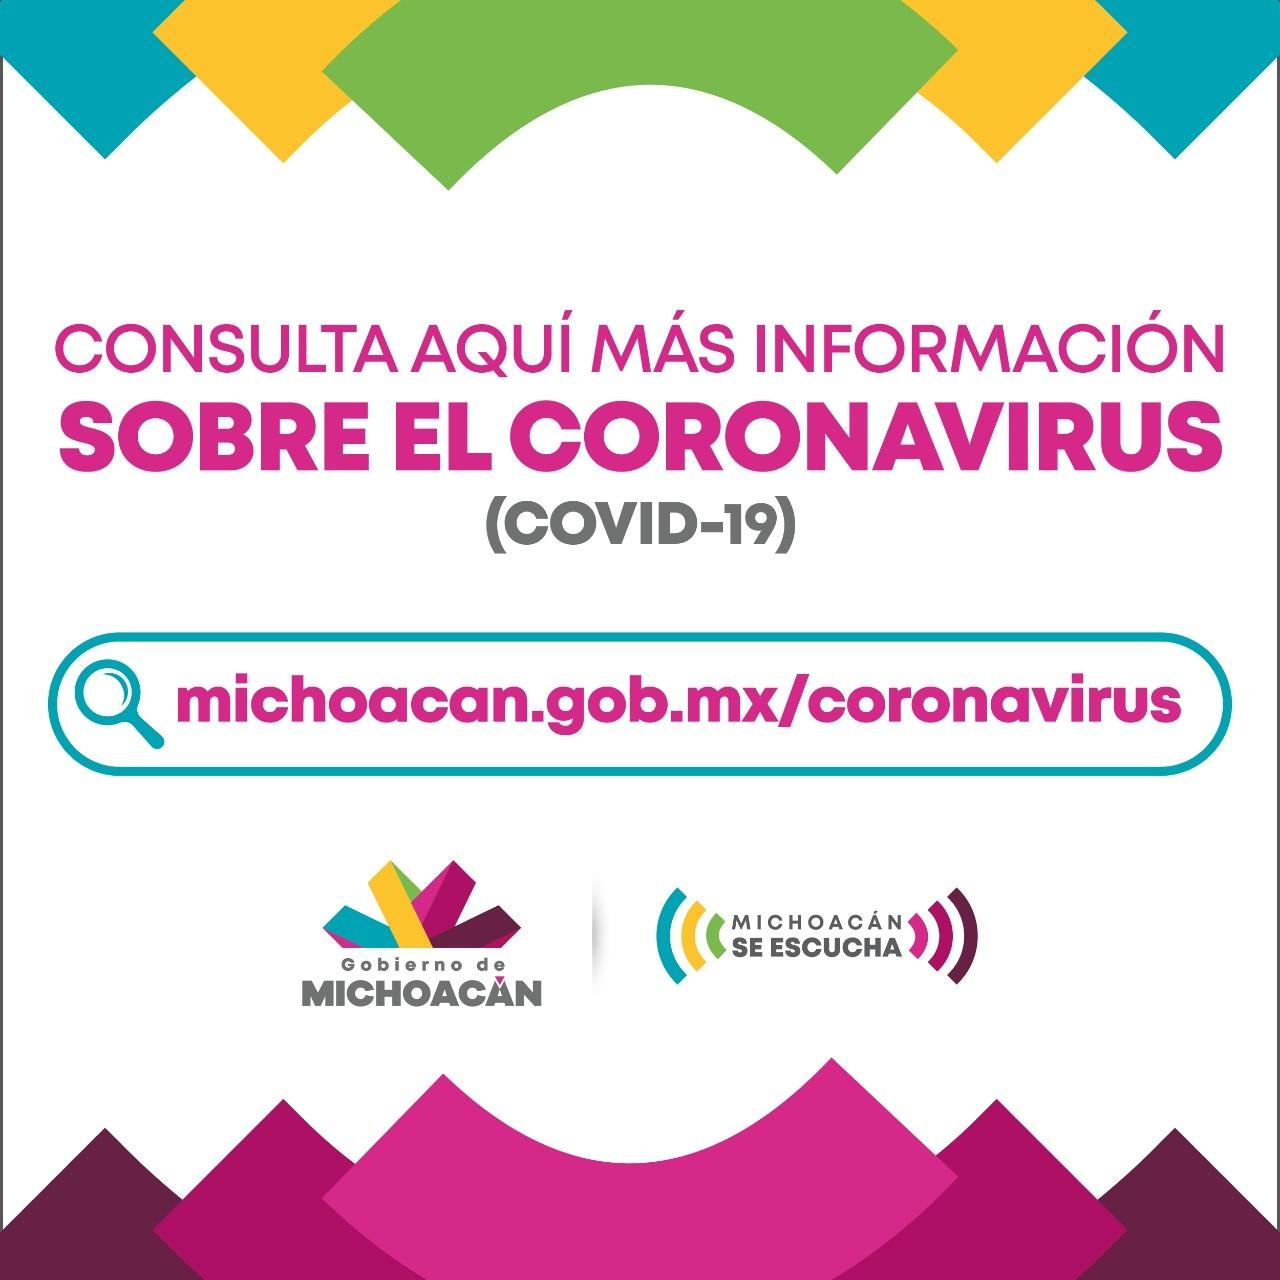 CONSULTA AQUI MAS INFORMACION COVID